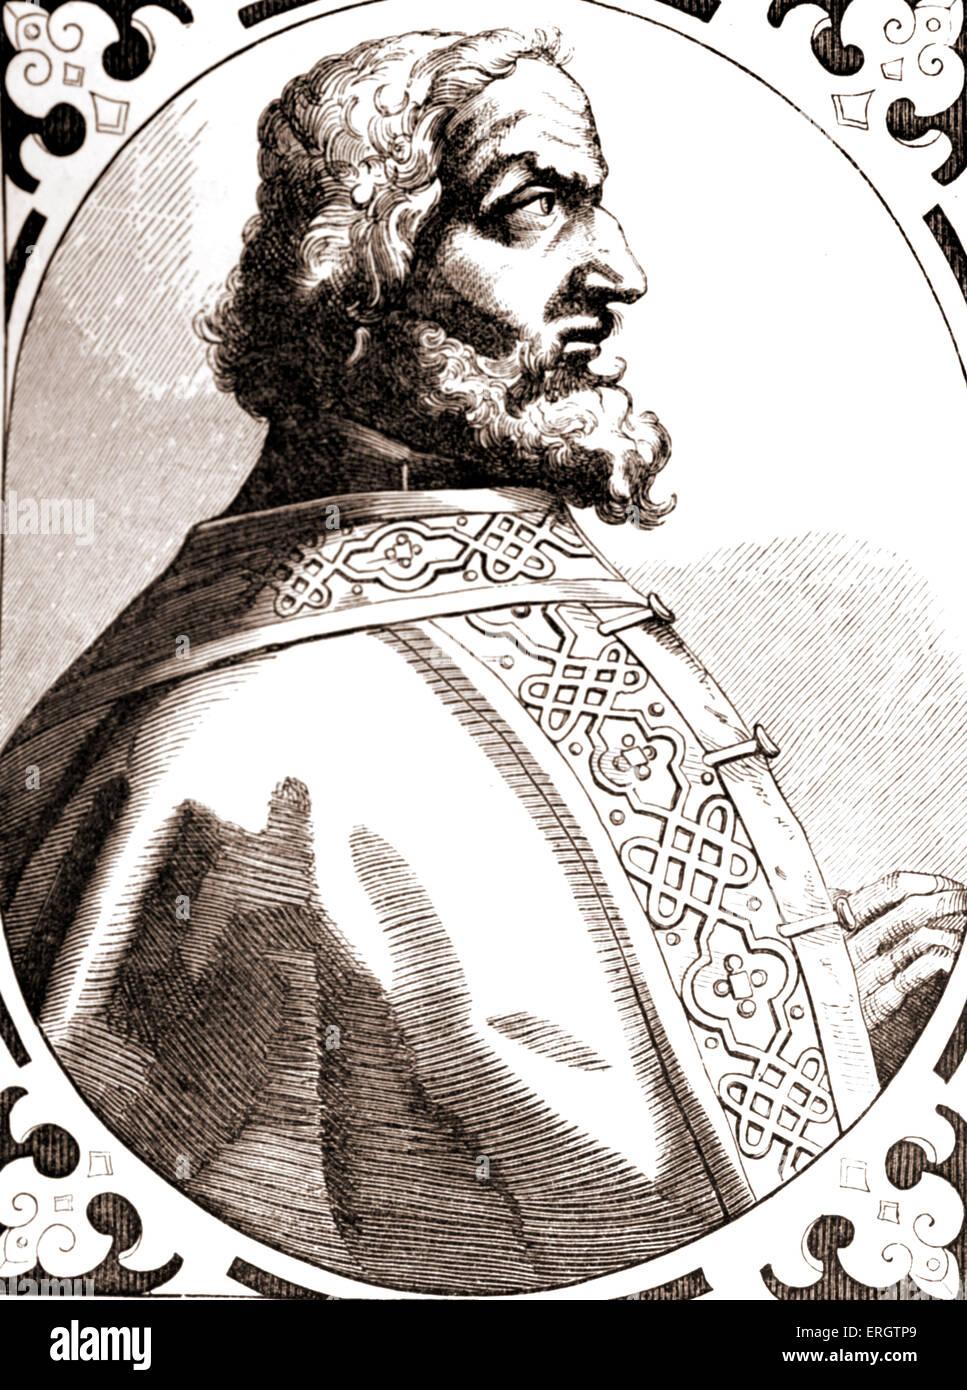 Karl der große (lateinisch: Carolus Magnus, d. h. Karl der große)-Portrait des Königs der Franken. Stockbild